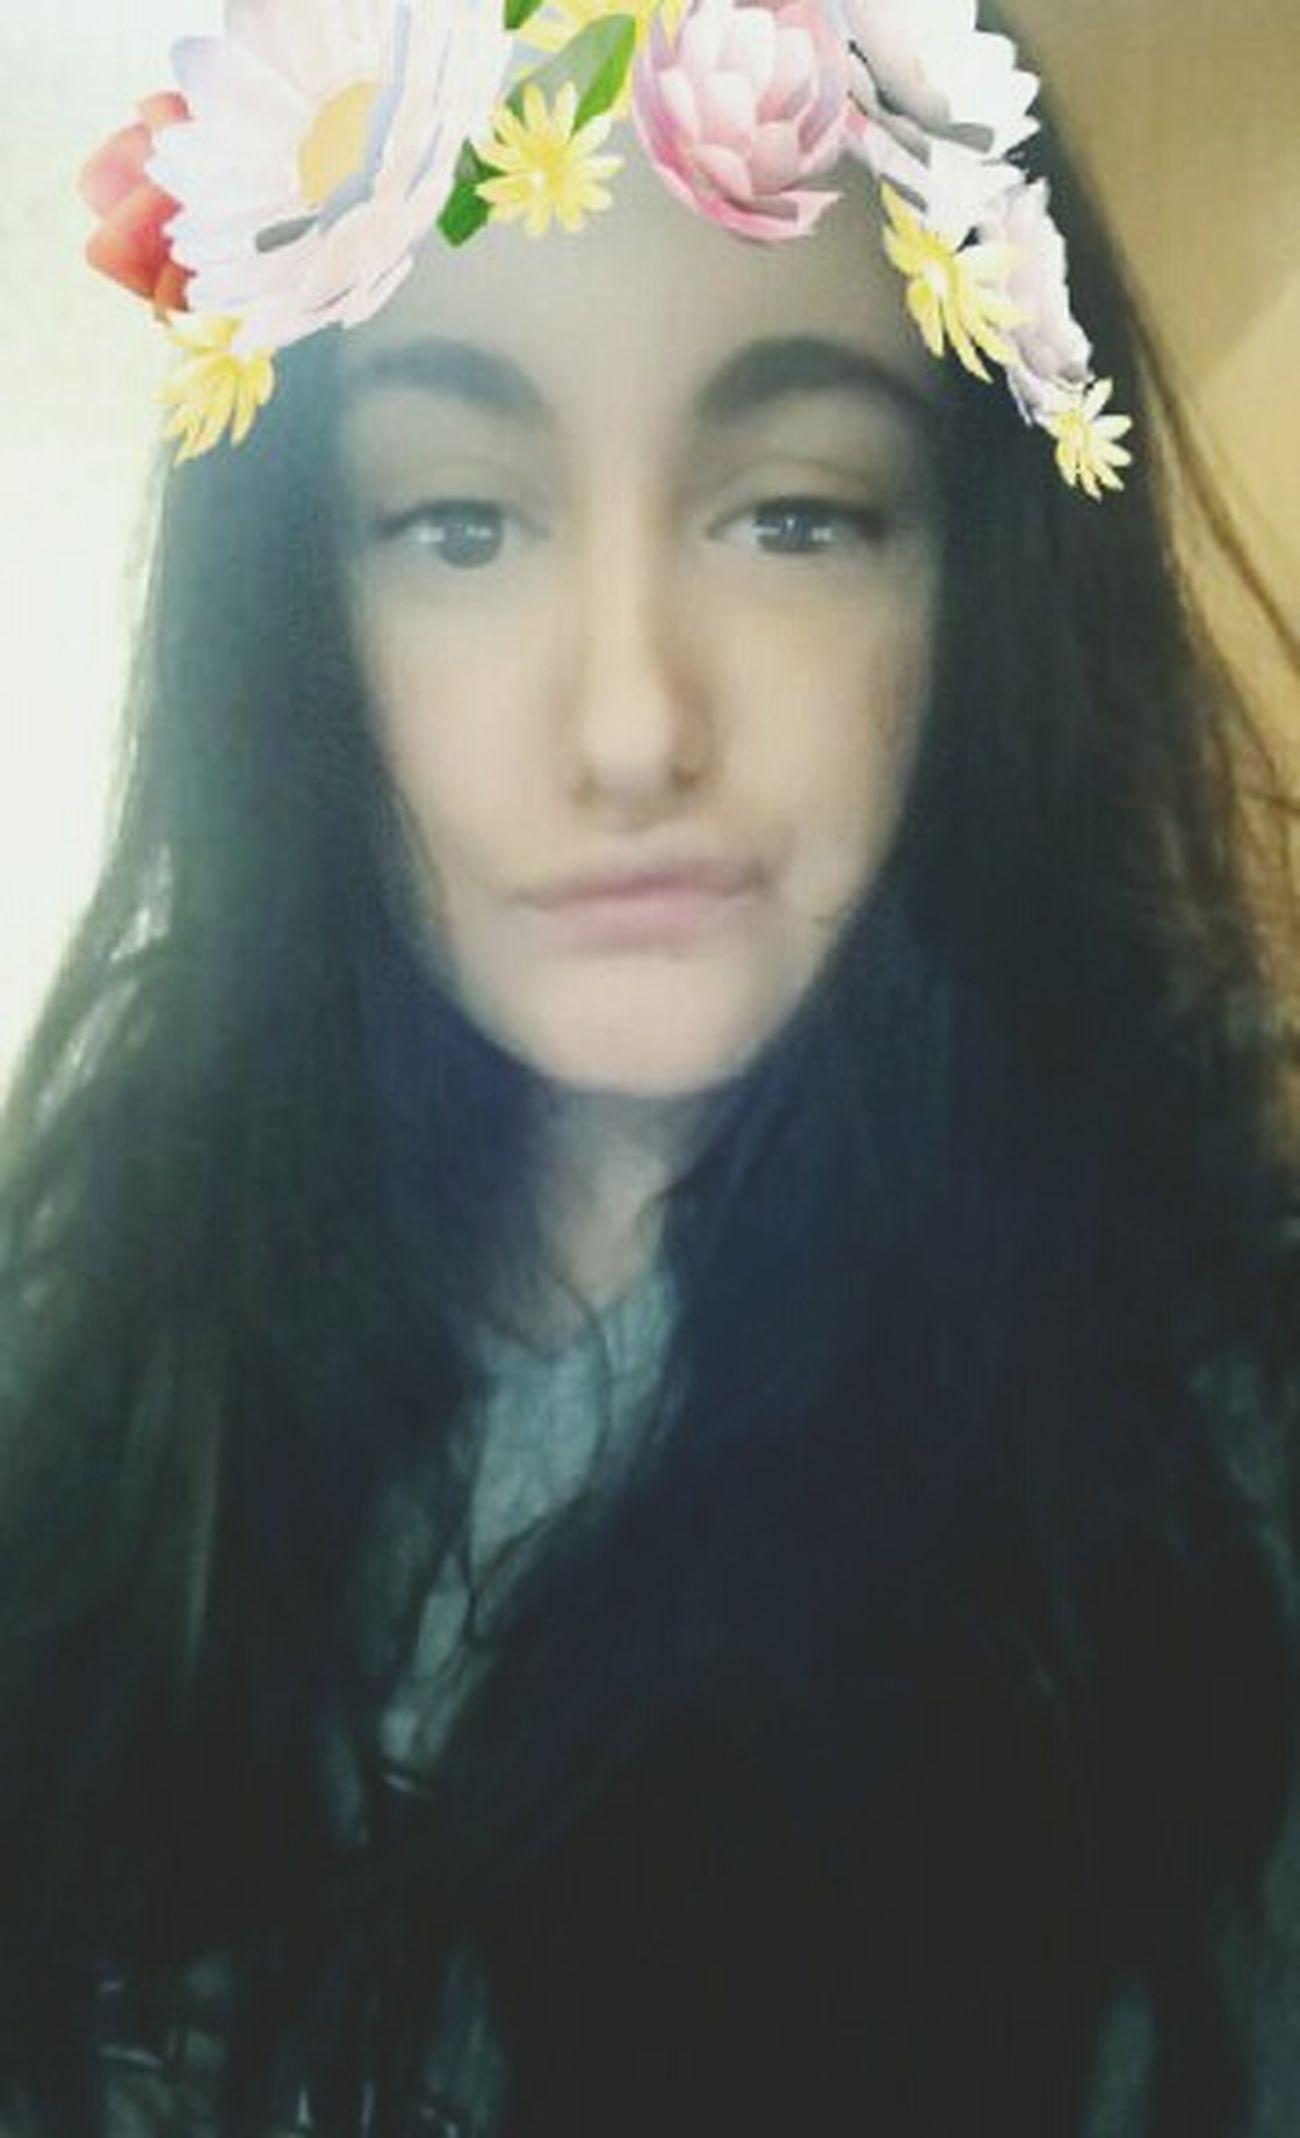 Feellikeadiva Feellikeamodel Model Modelgirl Snapchat Selfies Snapchat No Make-up No Makeup Without Makeup Girl Sexygirl SexyGirl.♥ Sexylips